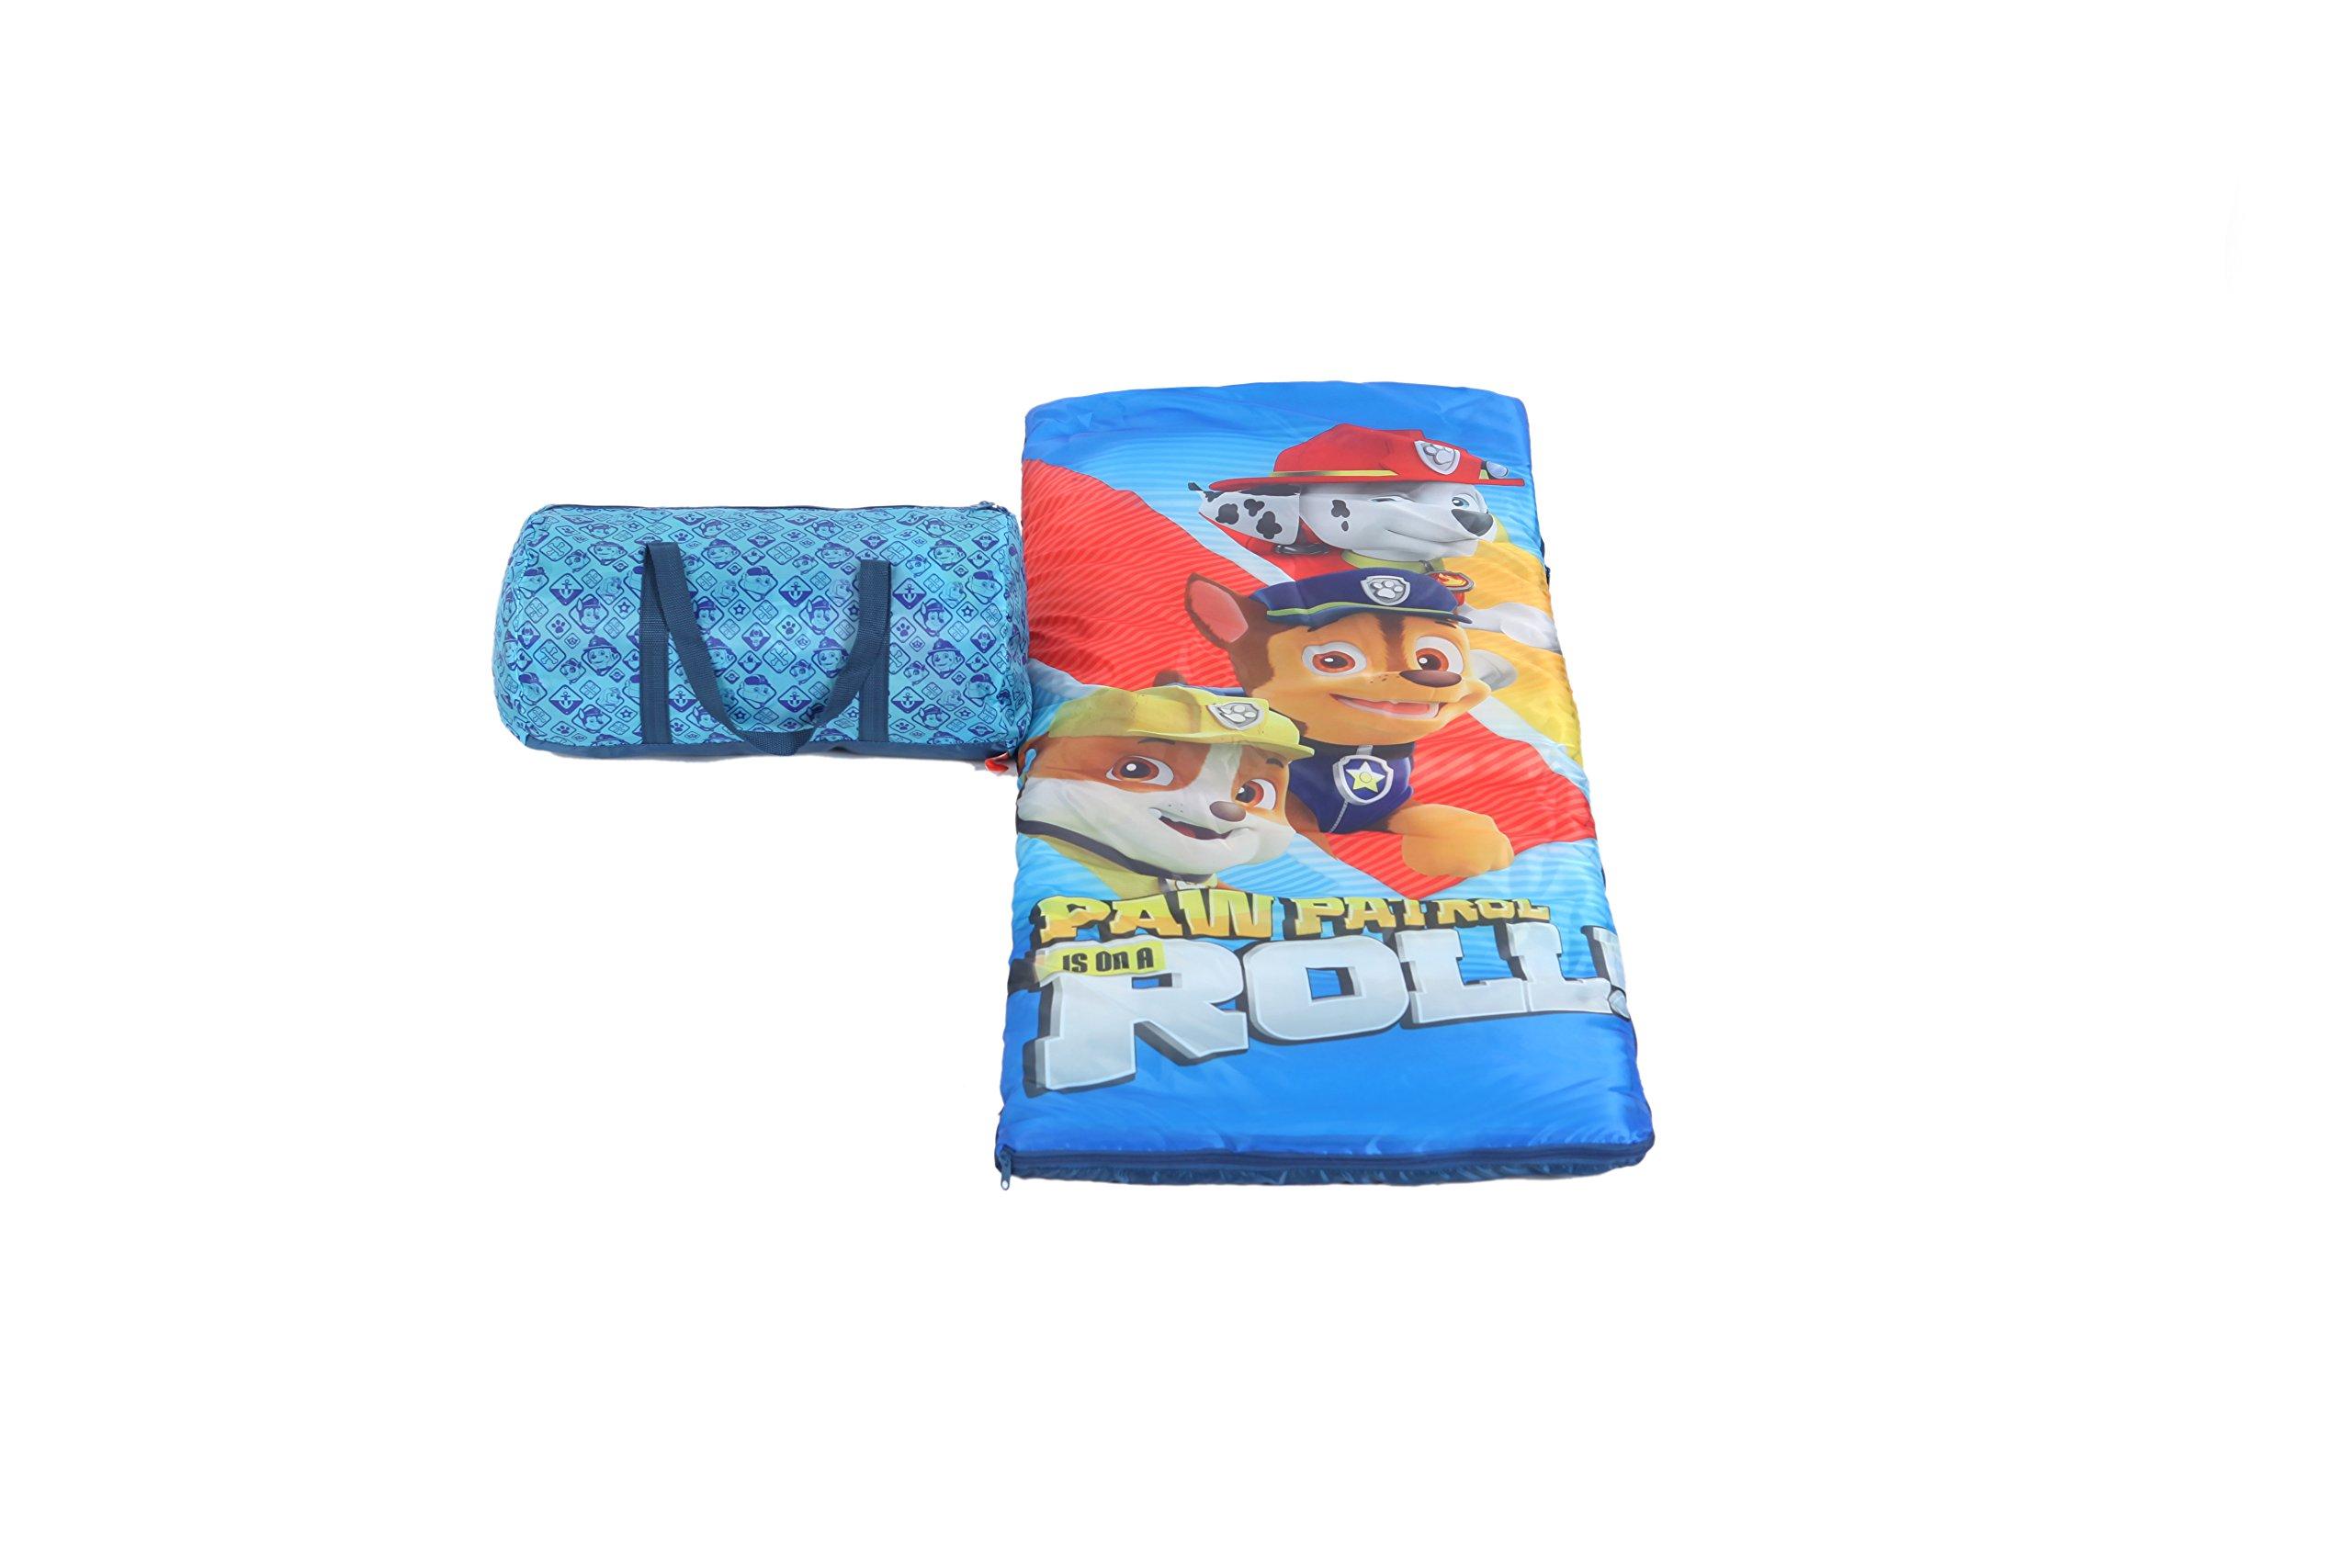 Nickelodeon Paw Patrol Sleeping Bag, Blue, 26'' x 46''